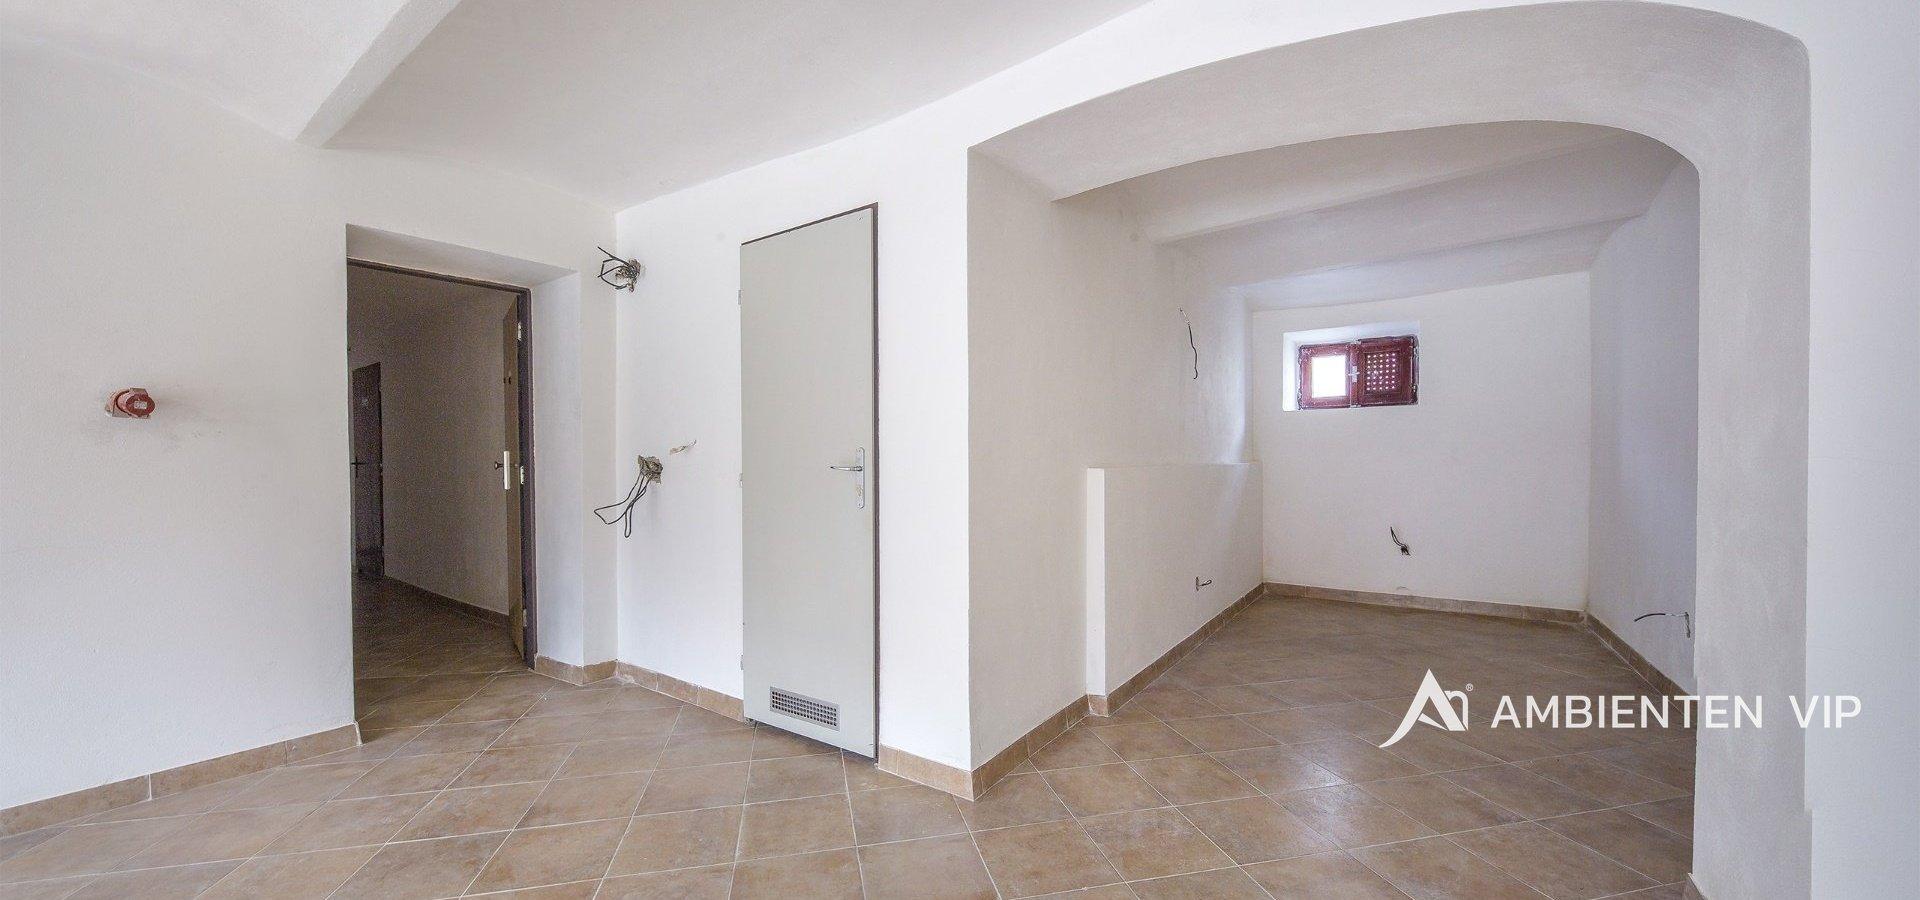 prodej-rodinneho-domu-na-bydleni-i-investici-477m2-telc-33merge-494c7c